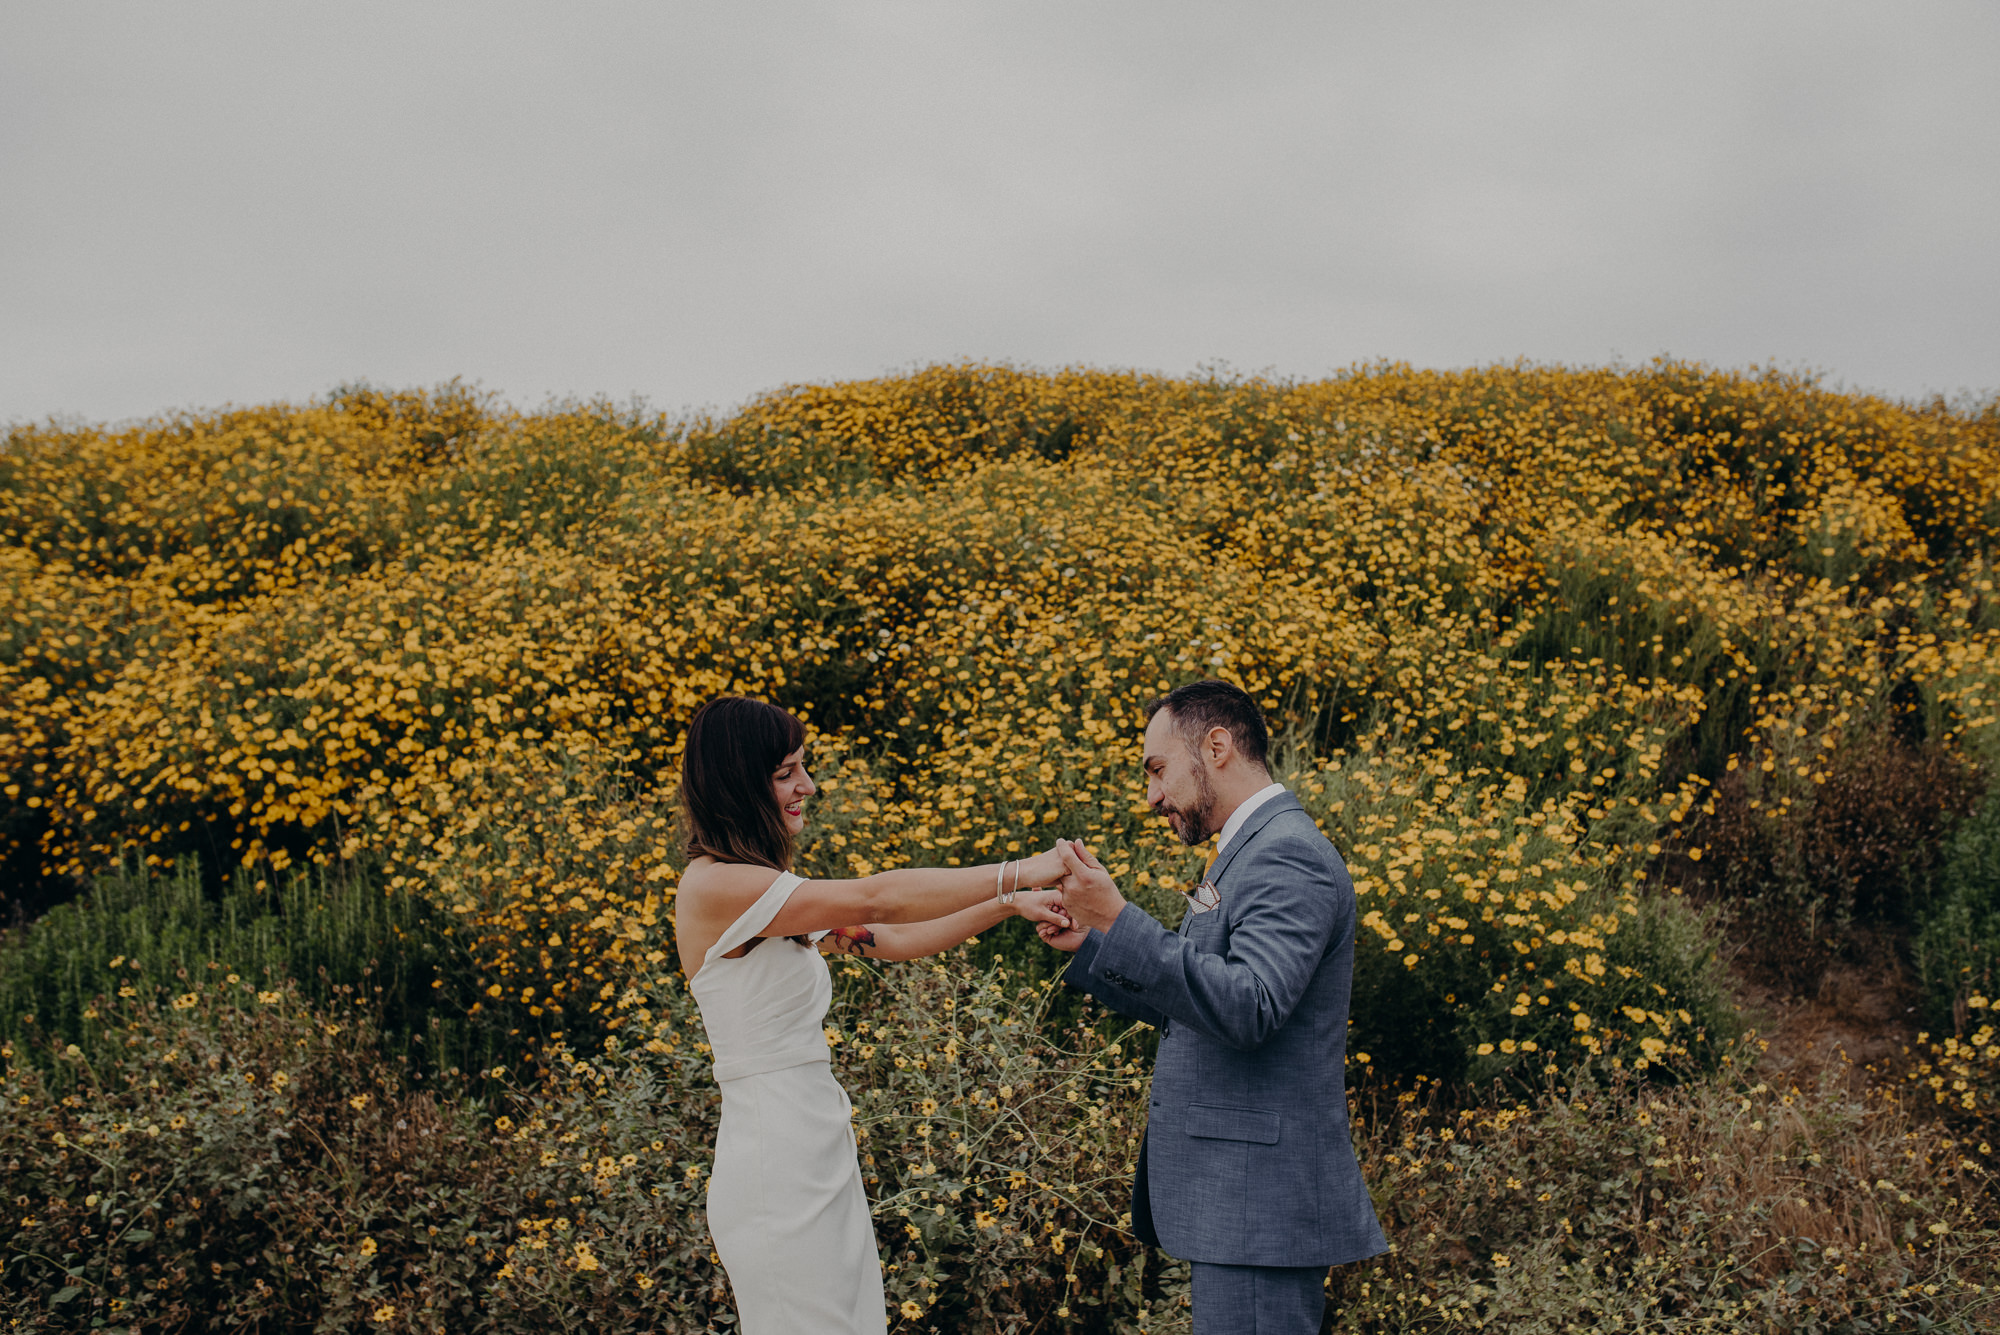 elopement photographer in los angeles - la wedding photographer - isaiahandtaylor.com-014.jpg